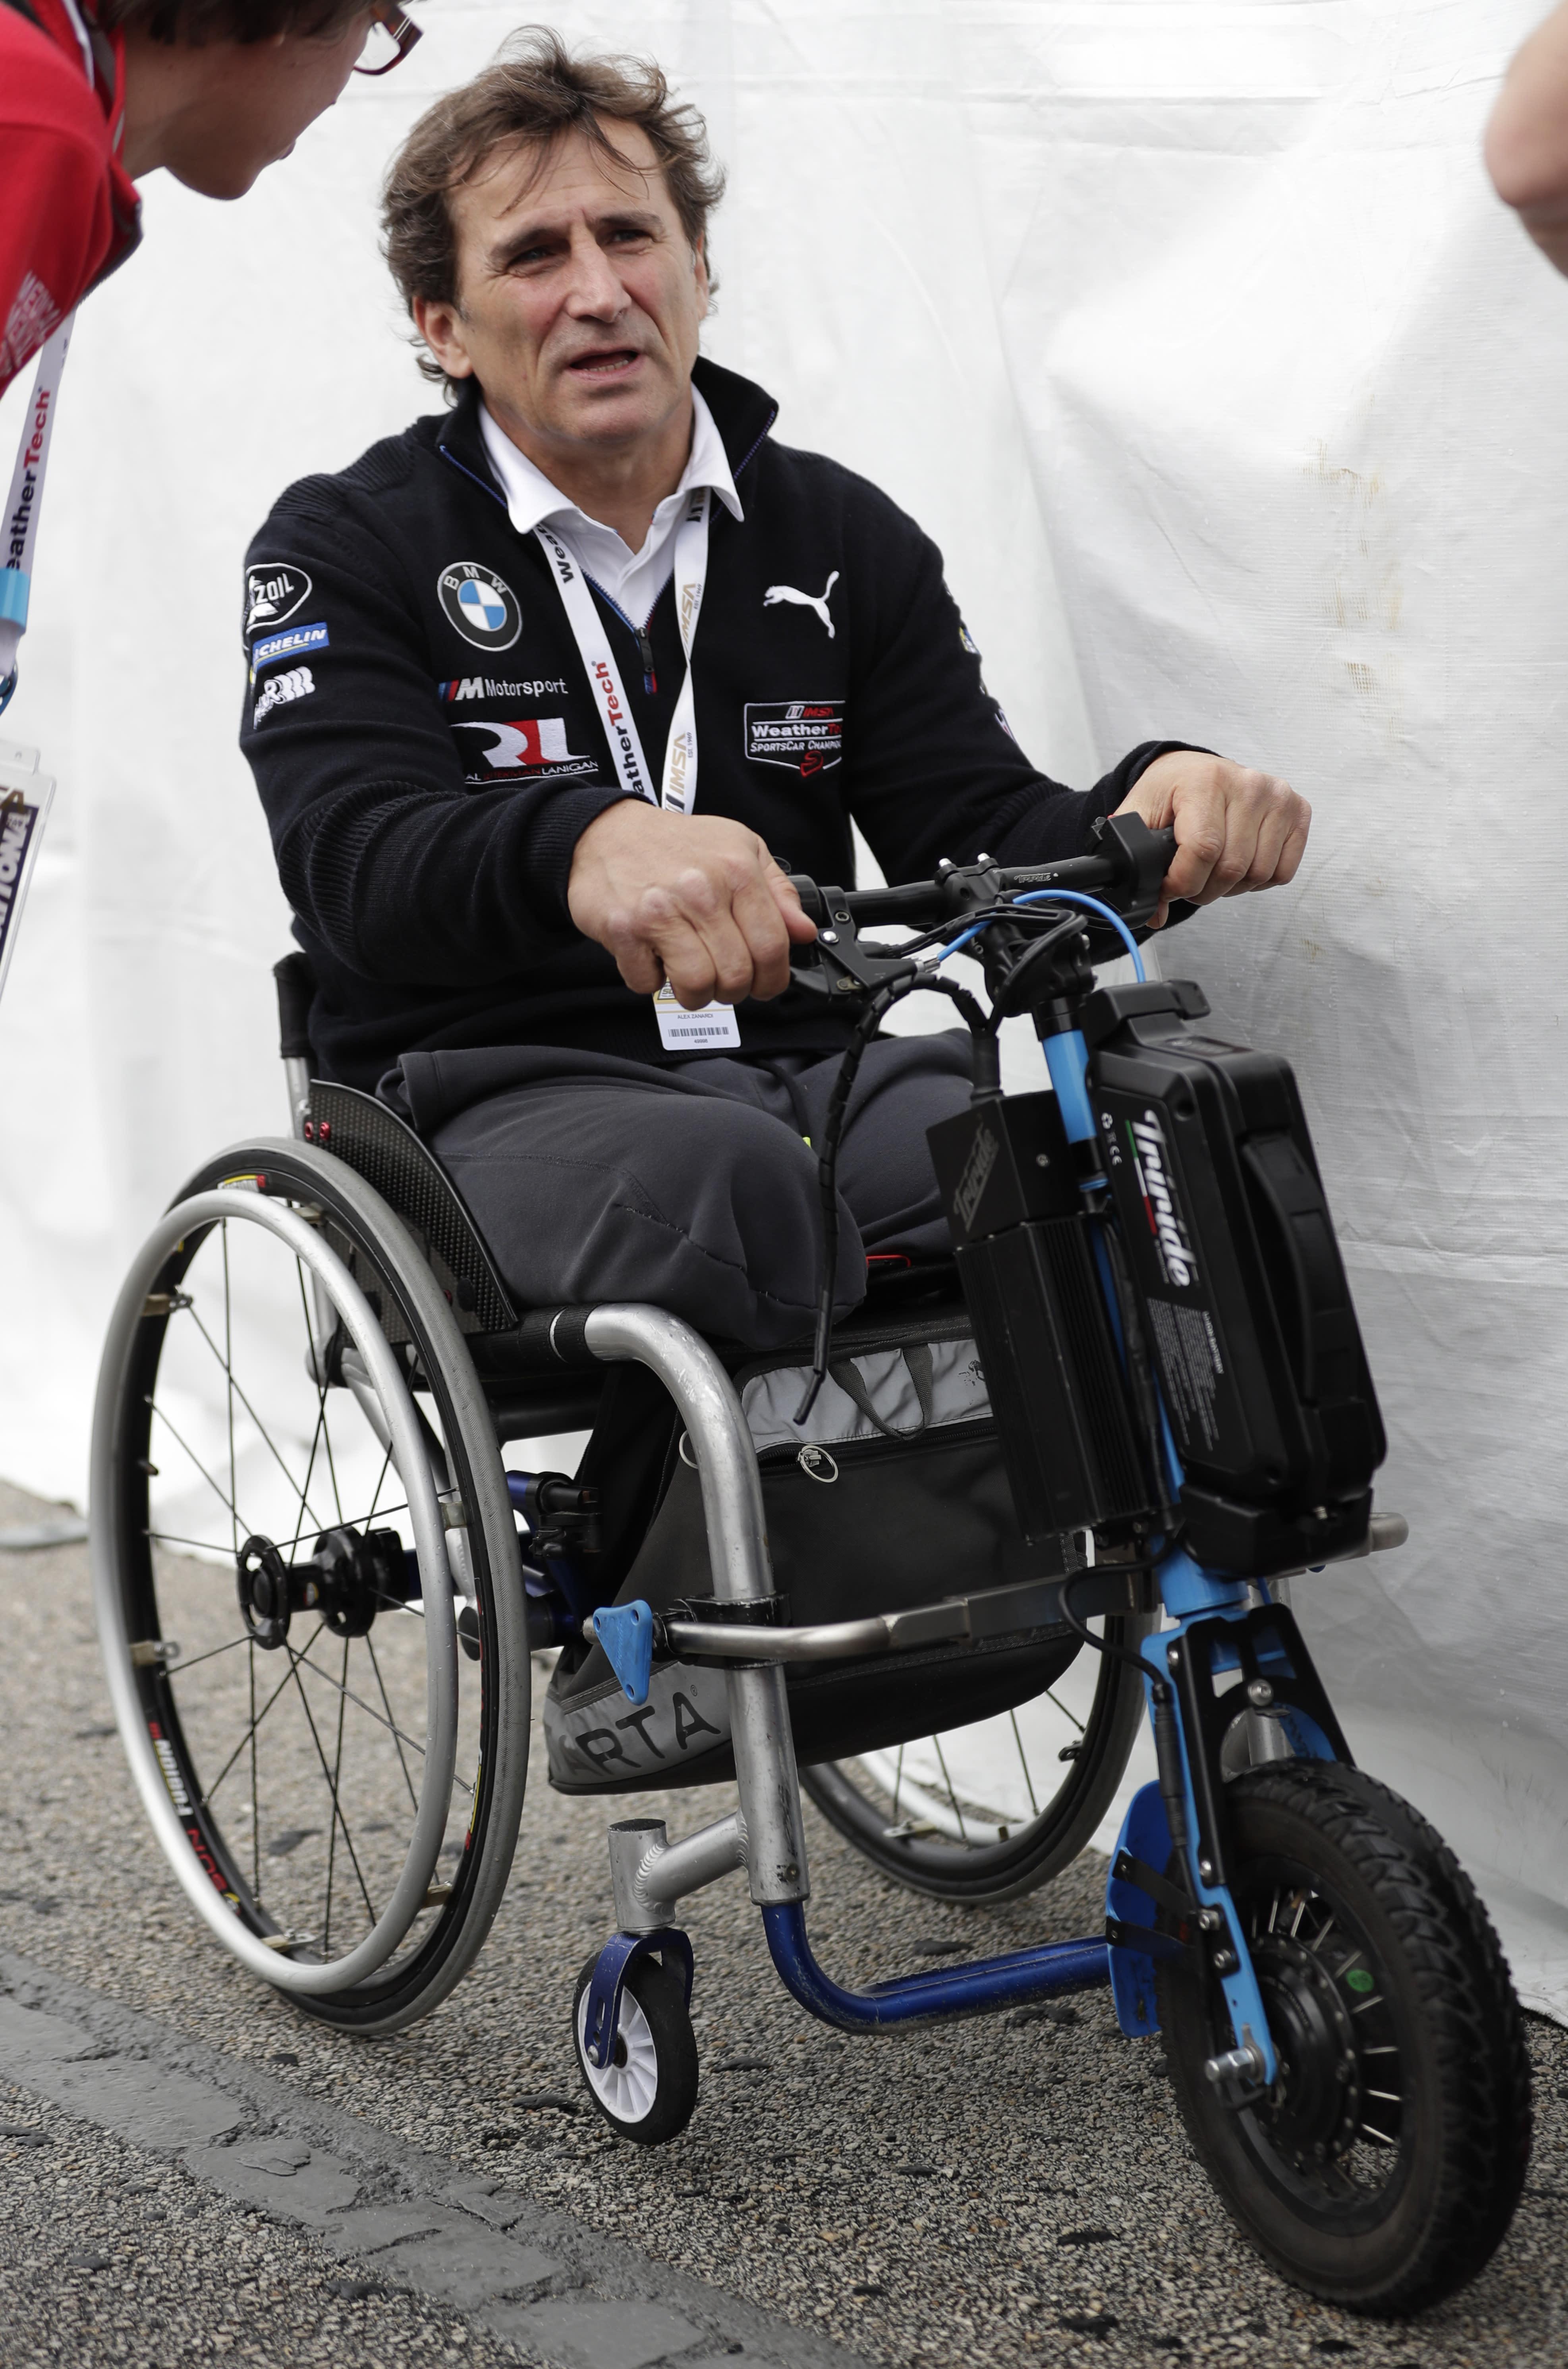 Alex Zanardi talks with visitors outside his pit stall during a practice session for the IMSA 24 hour race at Daytona International Speedway, Thursday, Jan. 24, 2019, in Daytona Beach, Fla. (AP Photo/John Raoux)